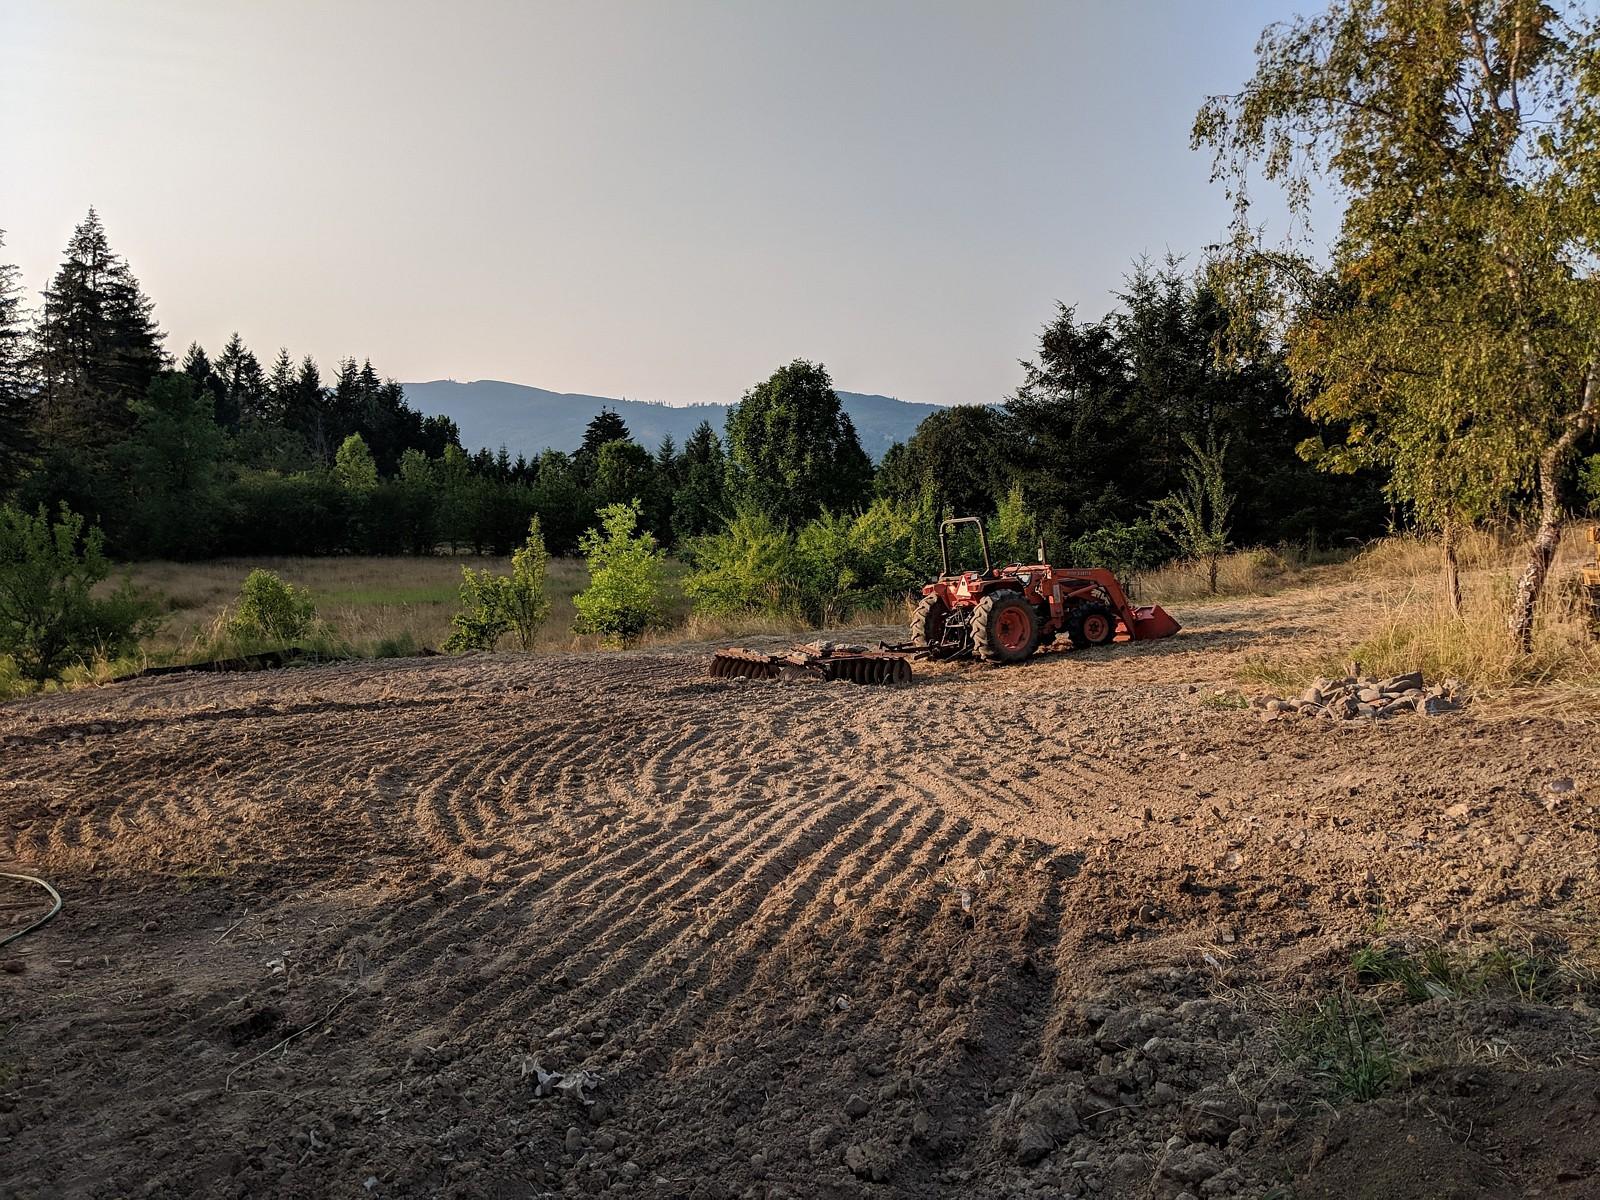 Tractor - mutti_wilson - Motocross Pictures - Vital MX